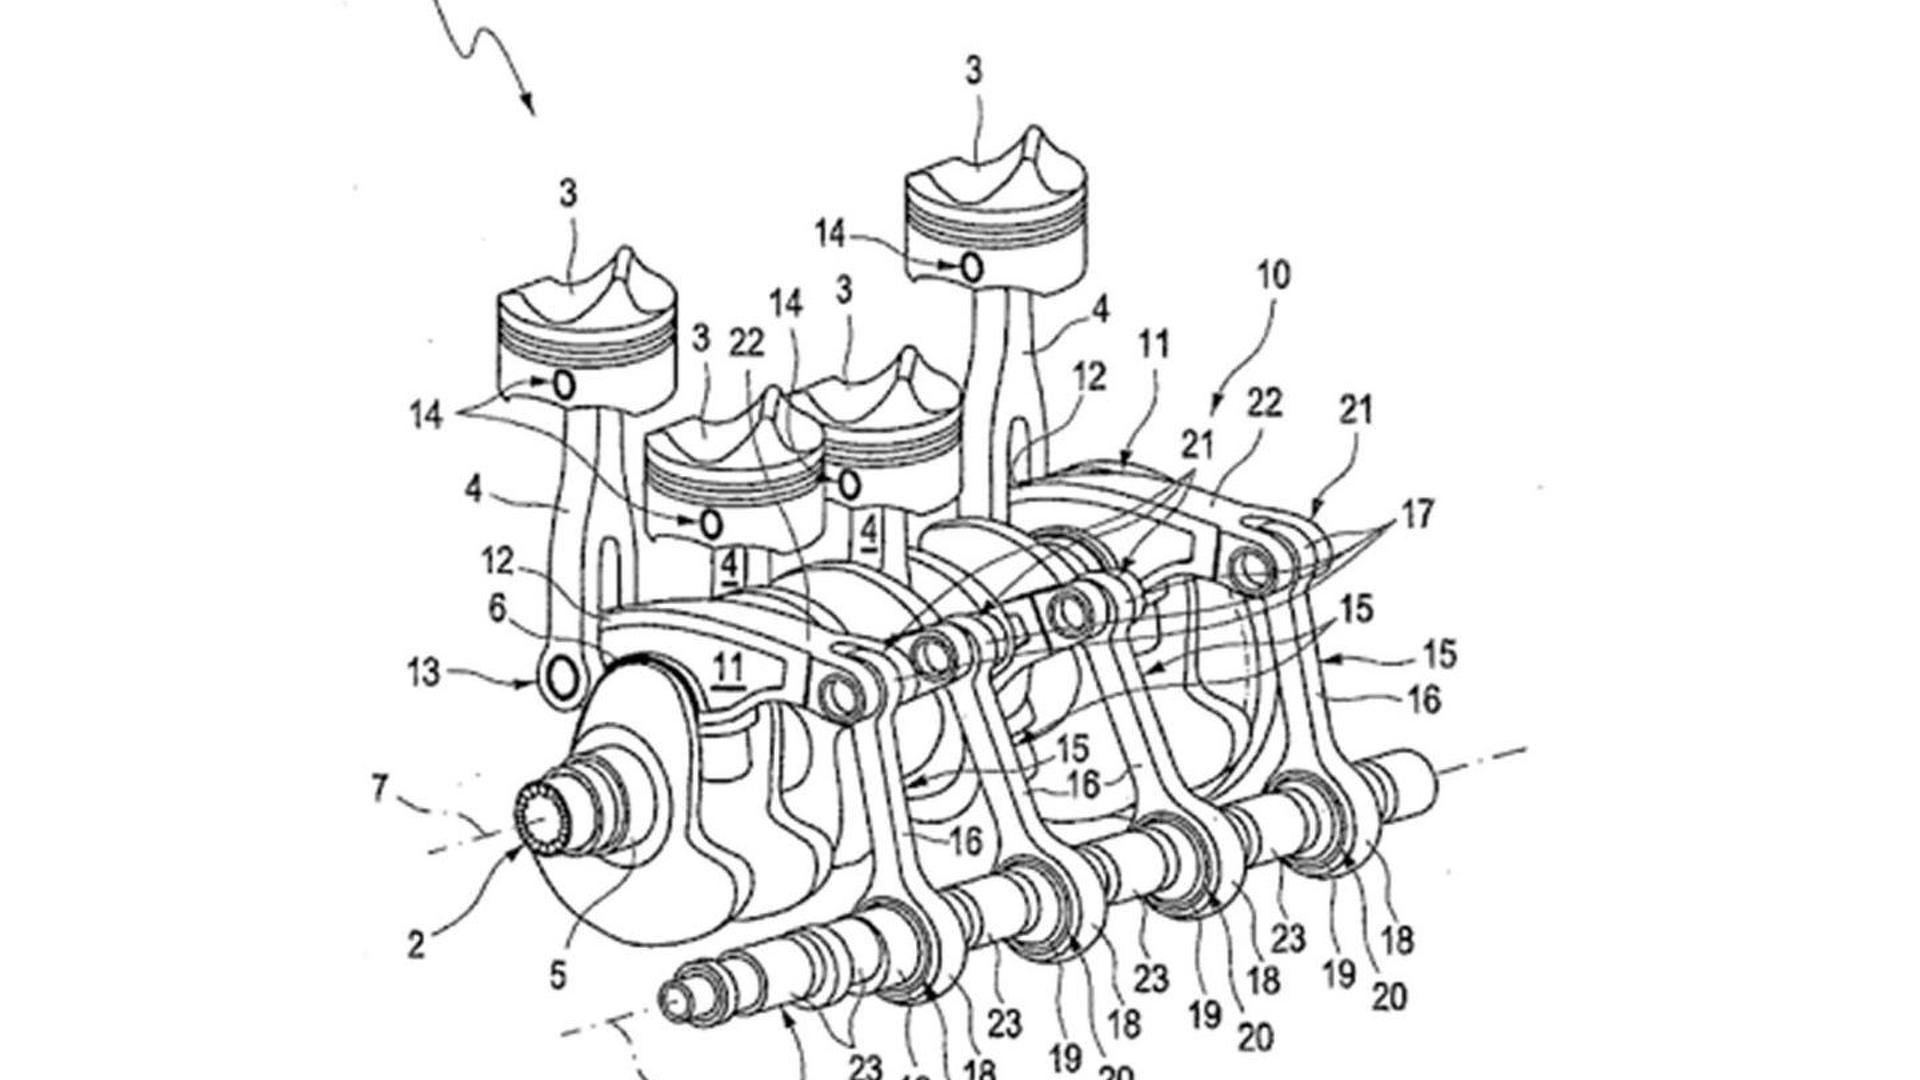 8 cylinder engine diagram wiring diagram completed  8 cylinder engine diagram #7